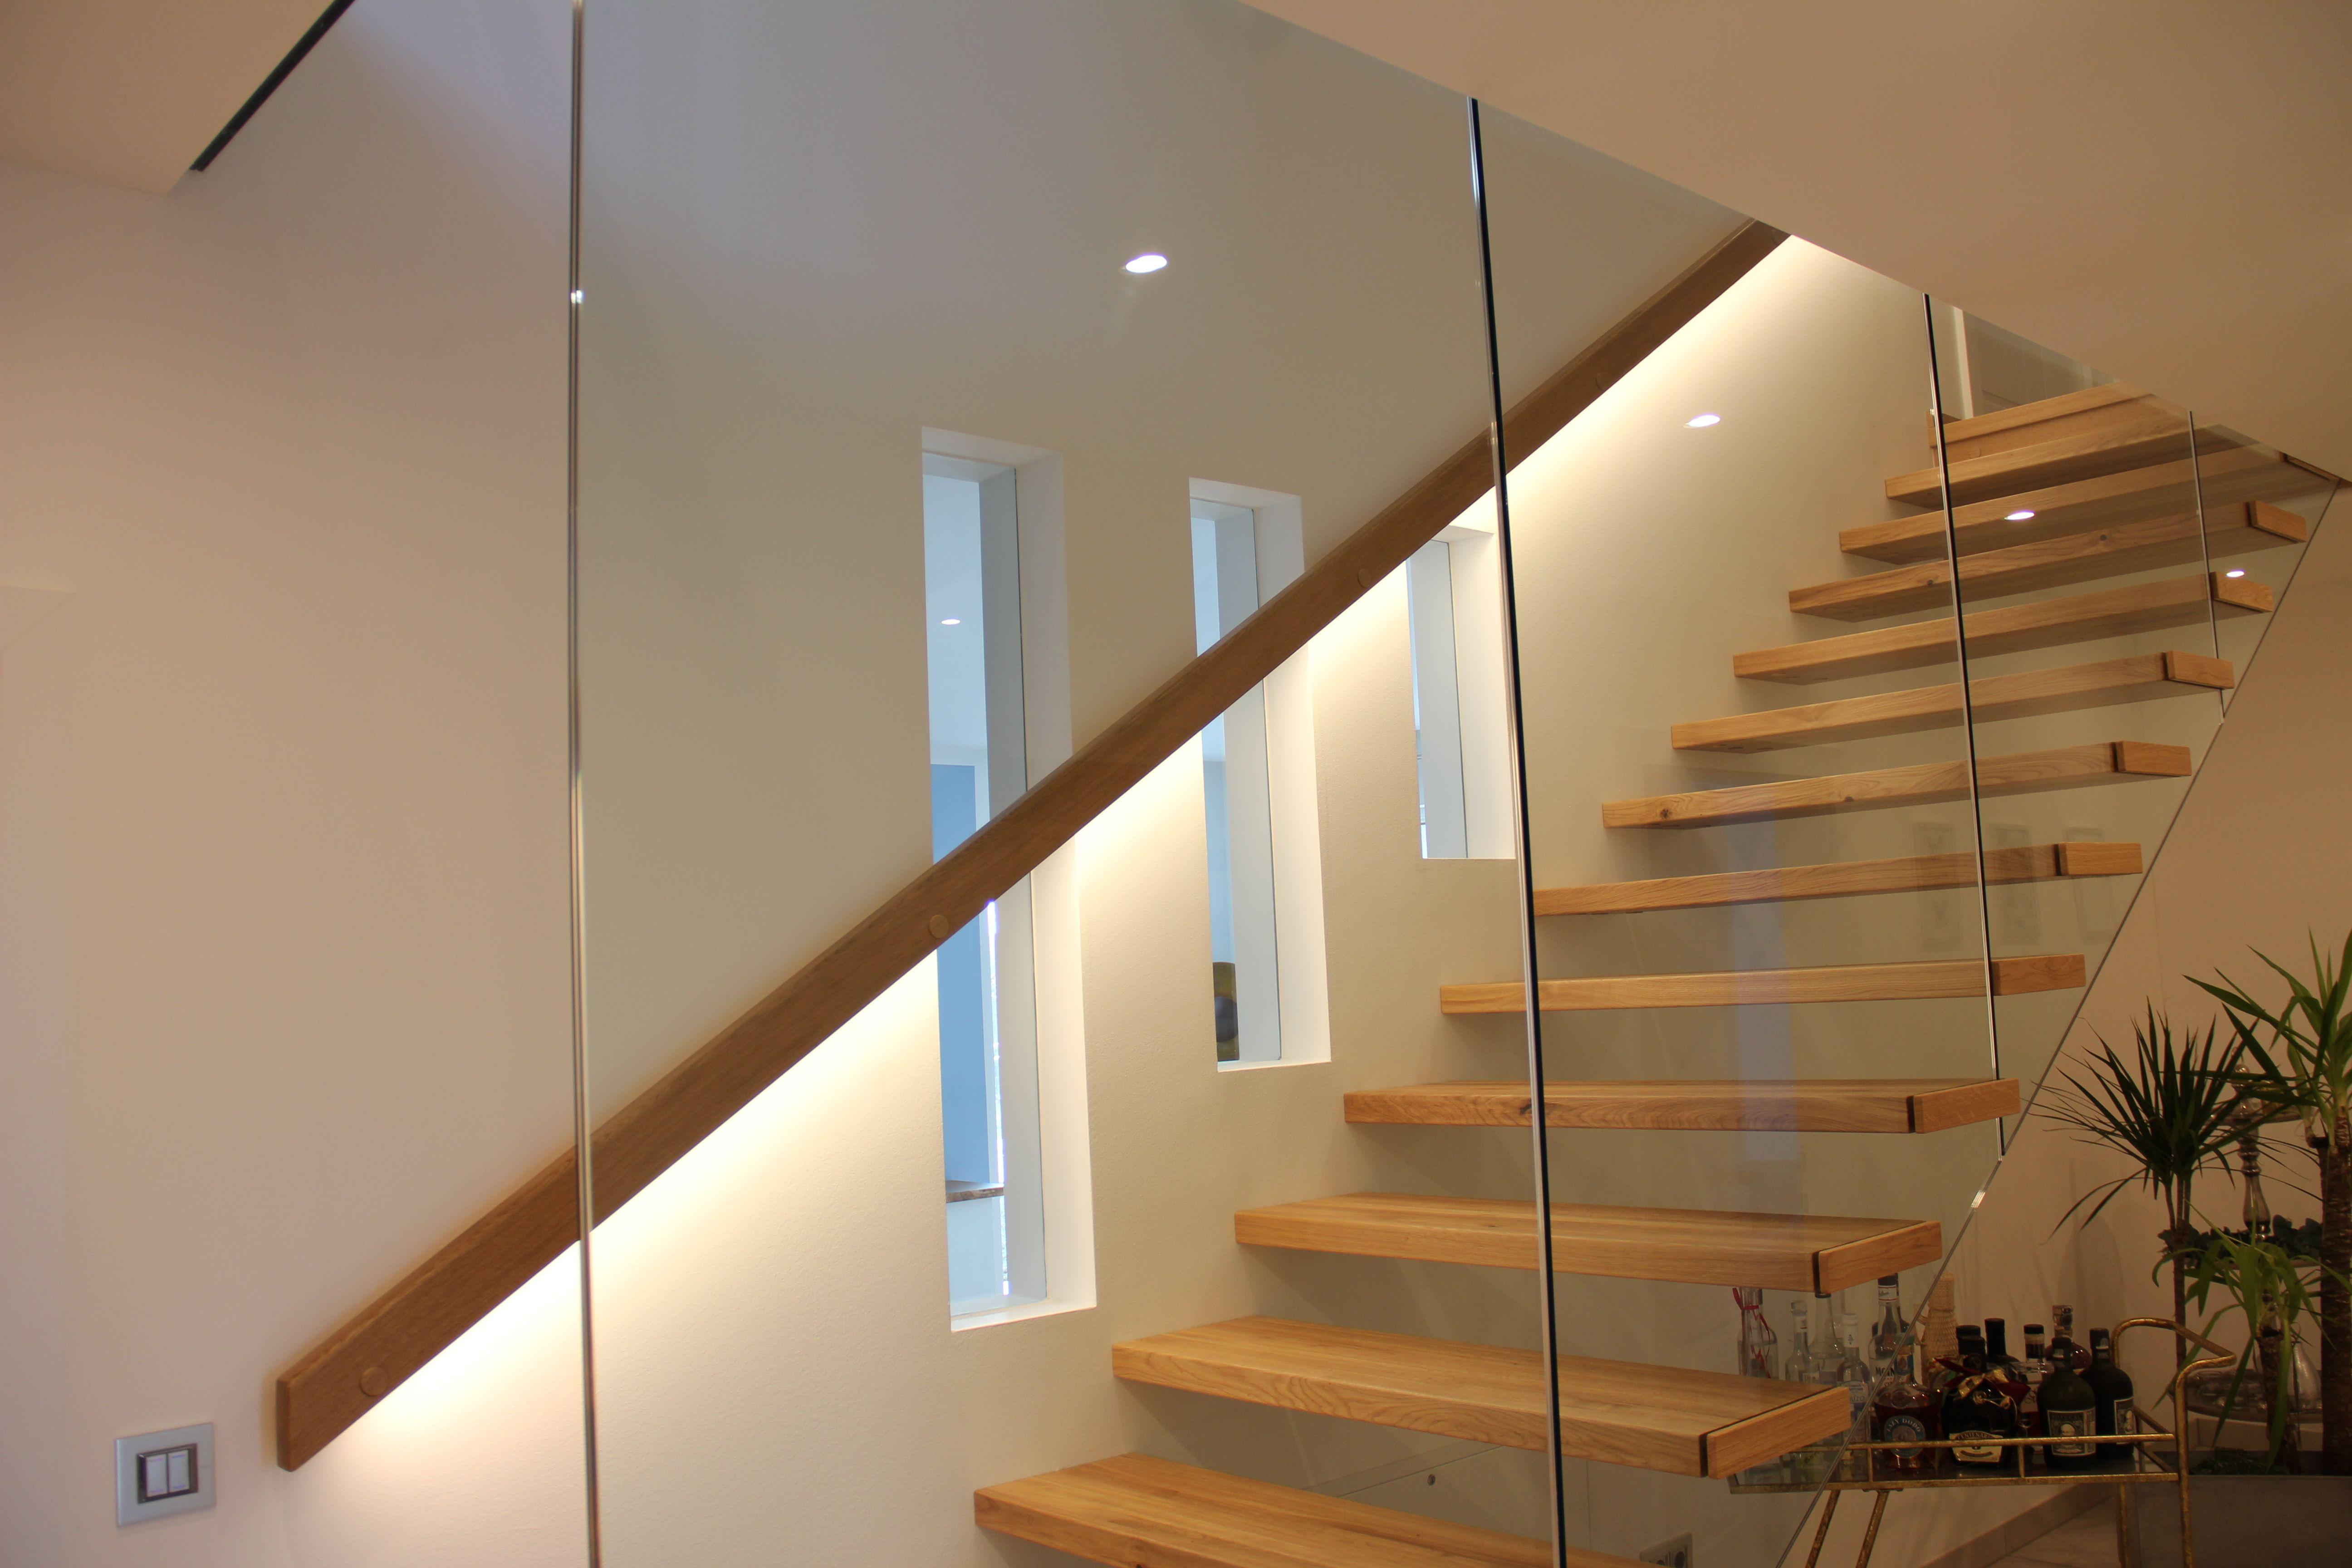 Treppenbeleuchtung In 2020 Treppenhaus Beleuchtung Treppenbeleuchtung Beleuchtung